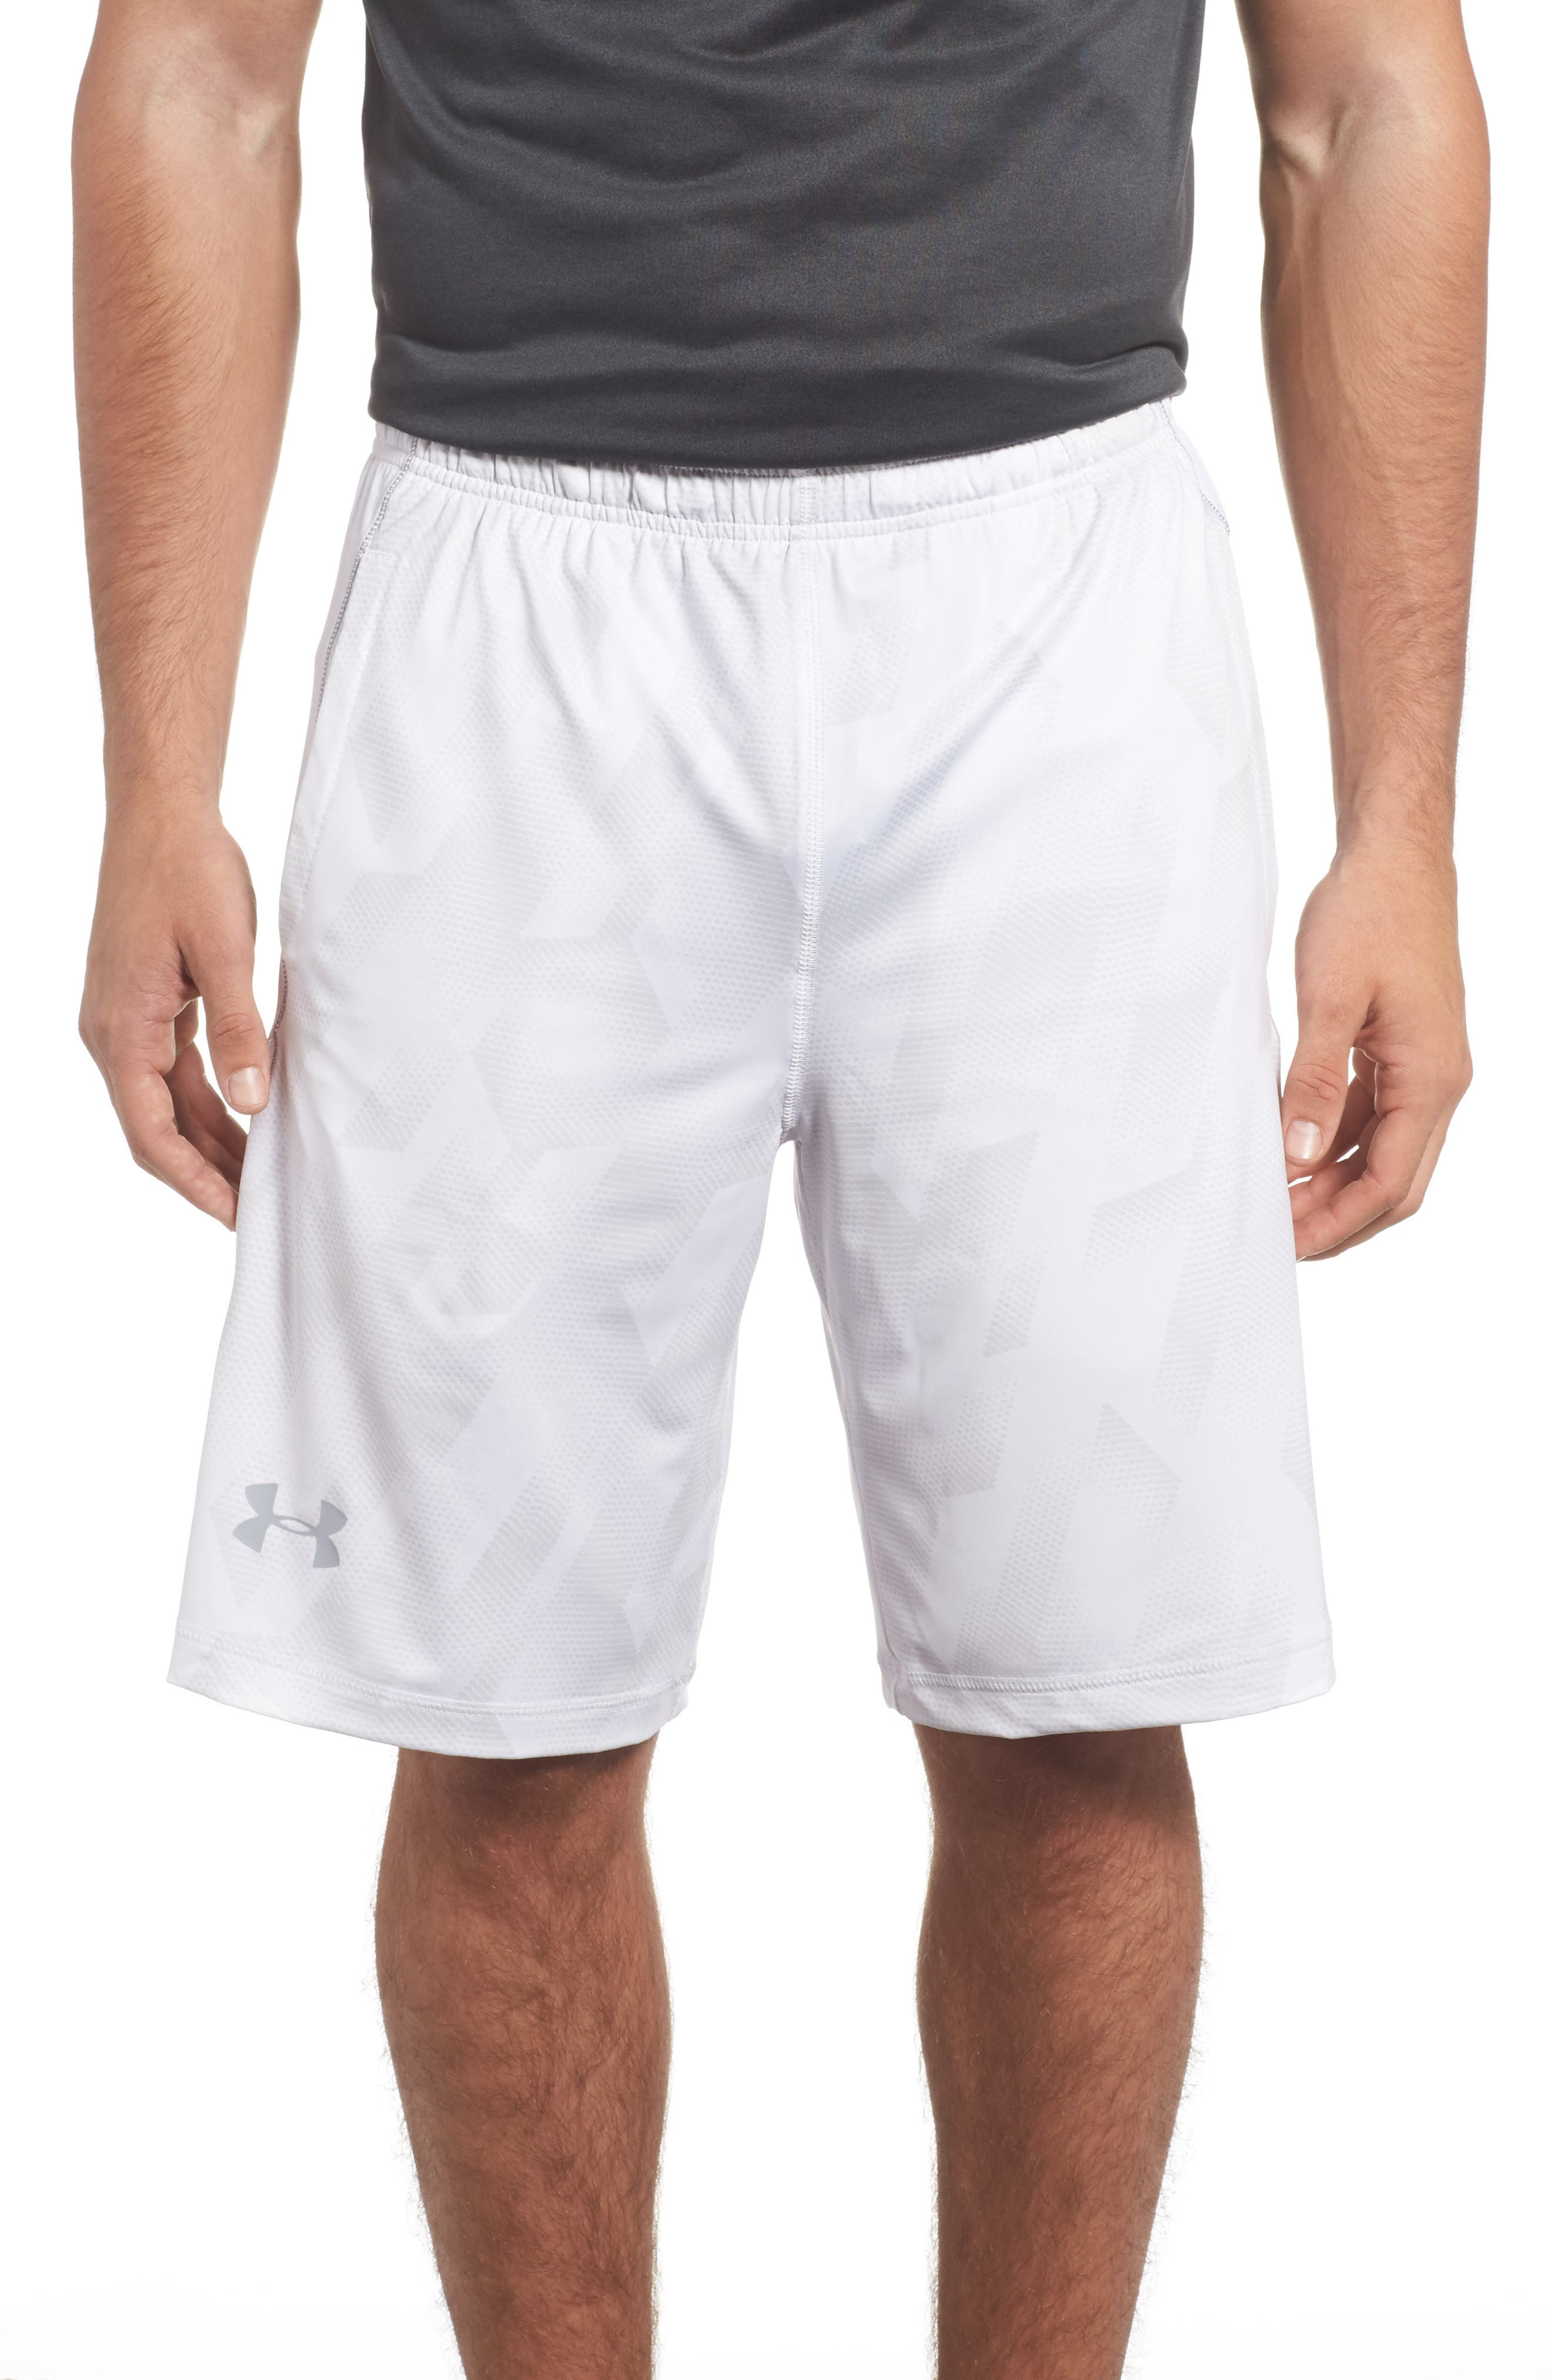 Under Armour 'Raid' HeatGear® Loose Fit Athletic Shorts